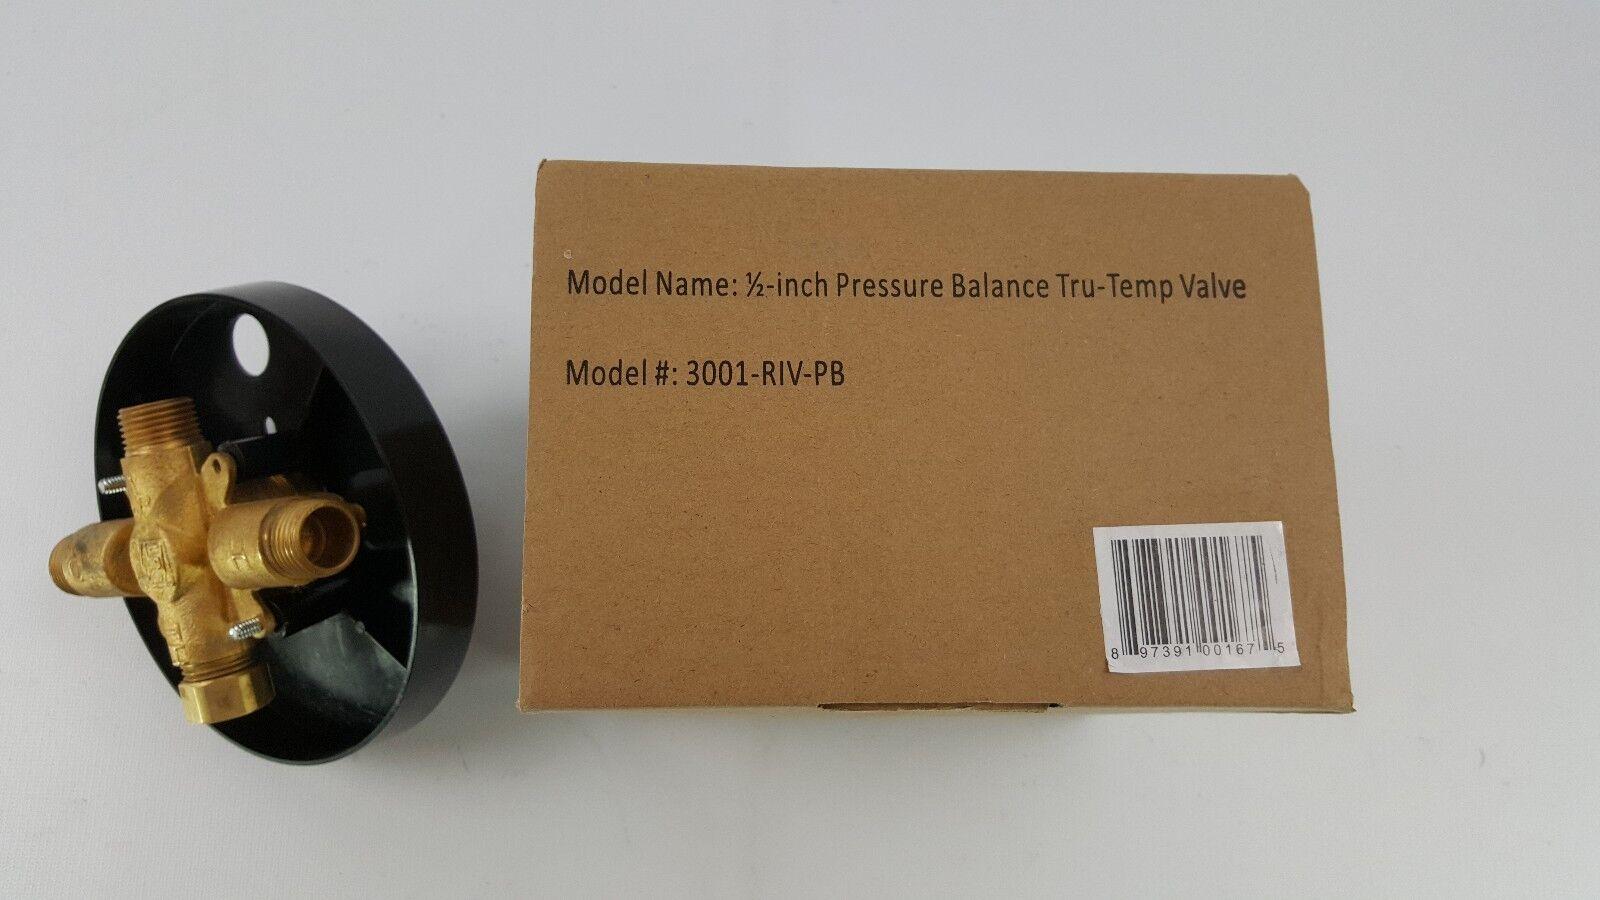 3001rivpbch Pulse Shower Spas 3001-RIV-PB-CH Trutemp Valve Chrome